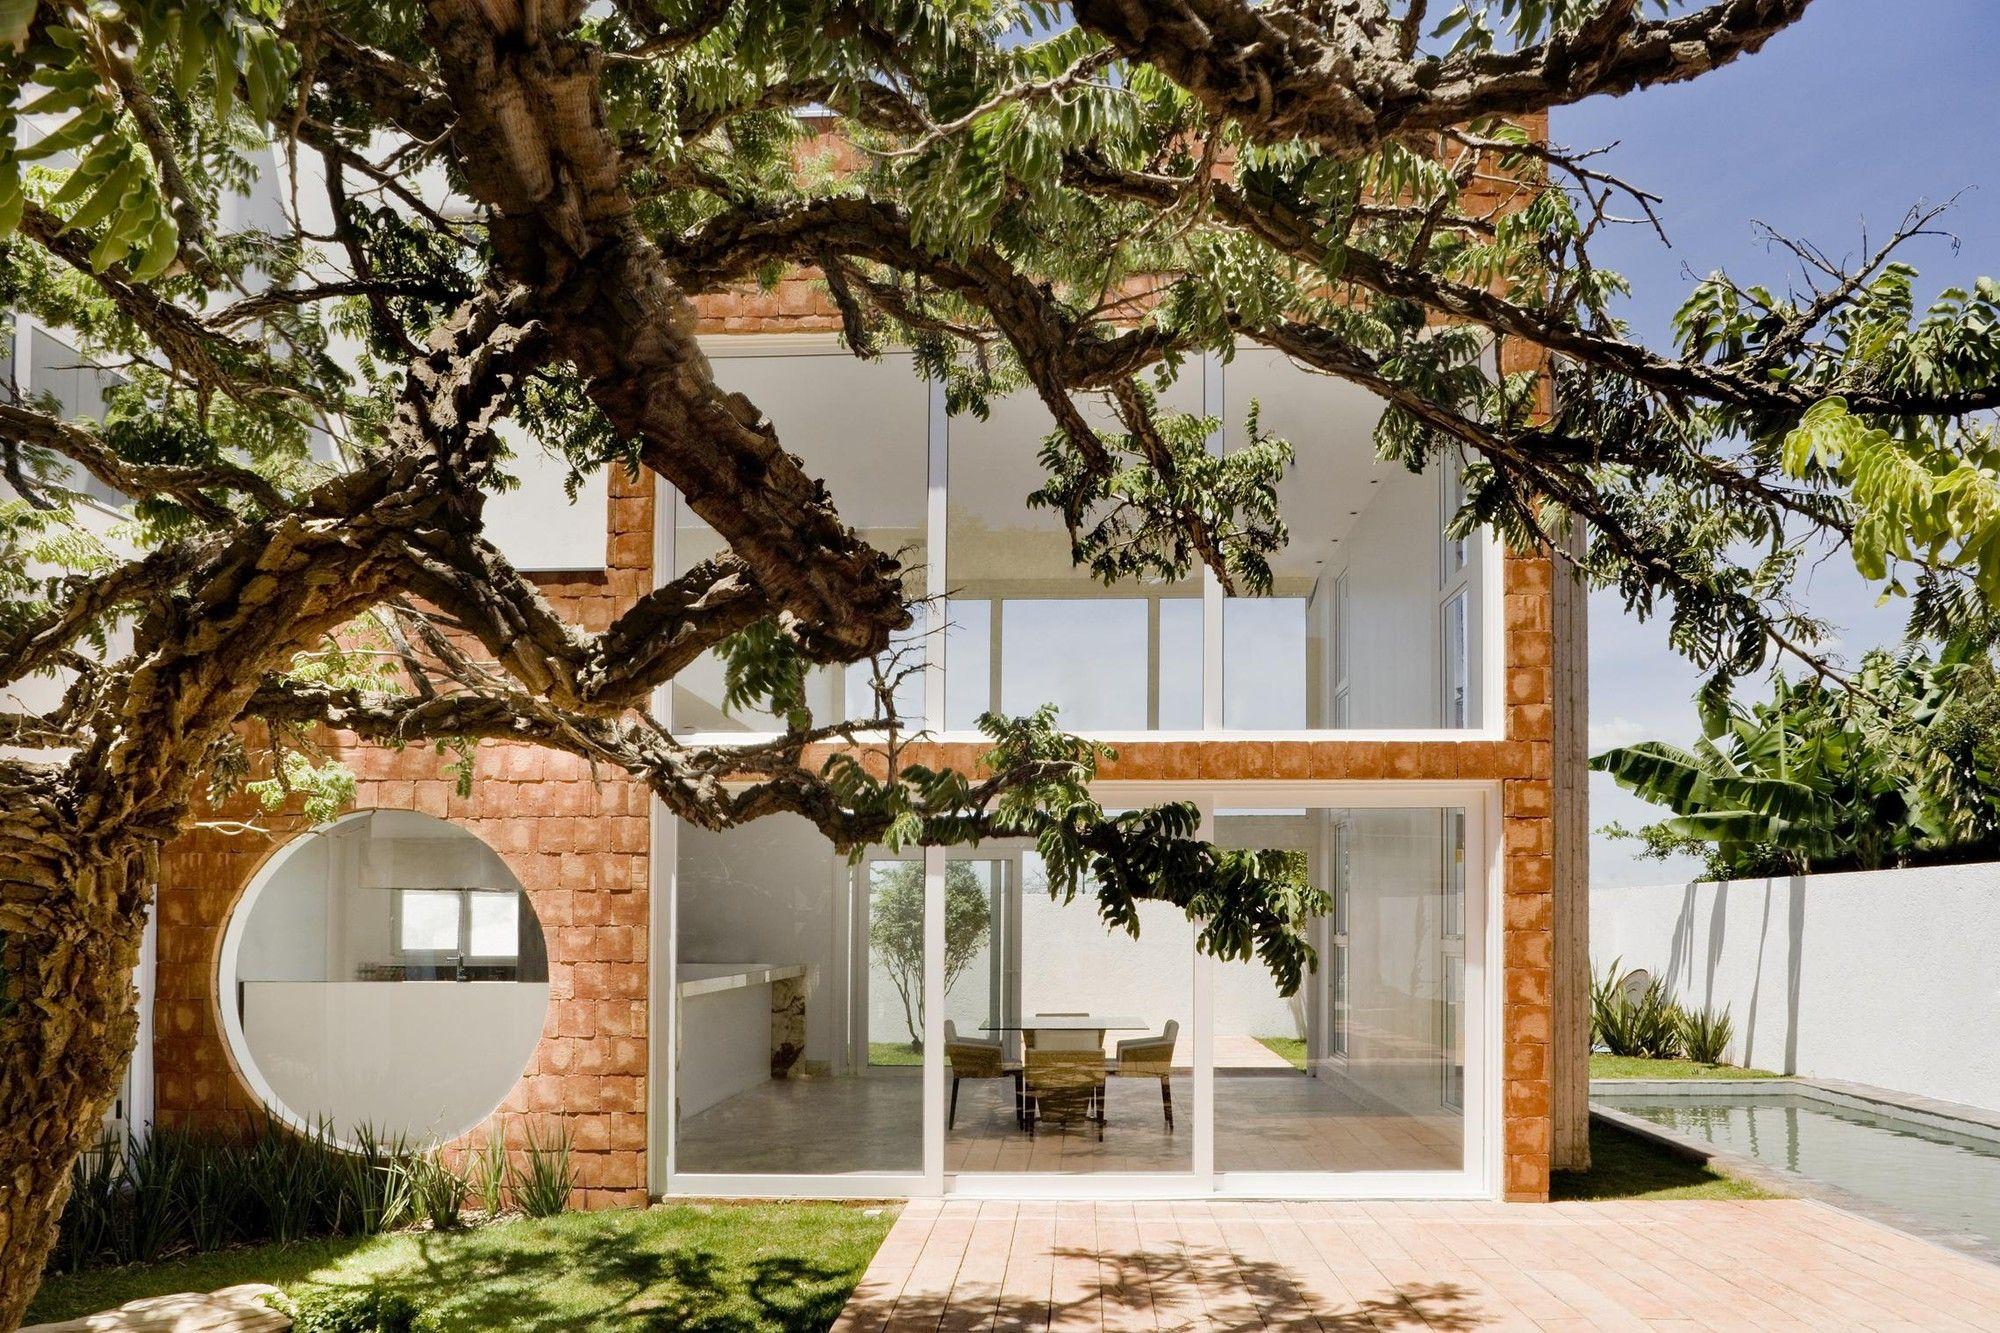 Nigeria house window design  gallery of taquari house  ney lima    lima architecture